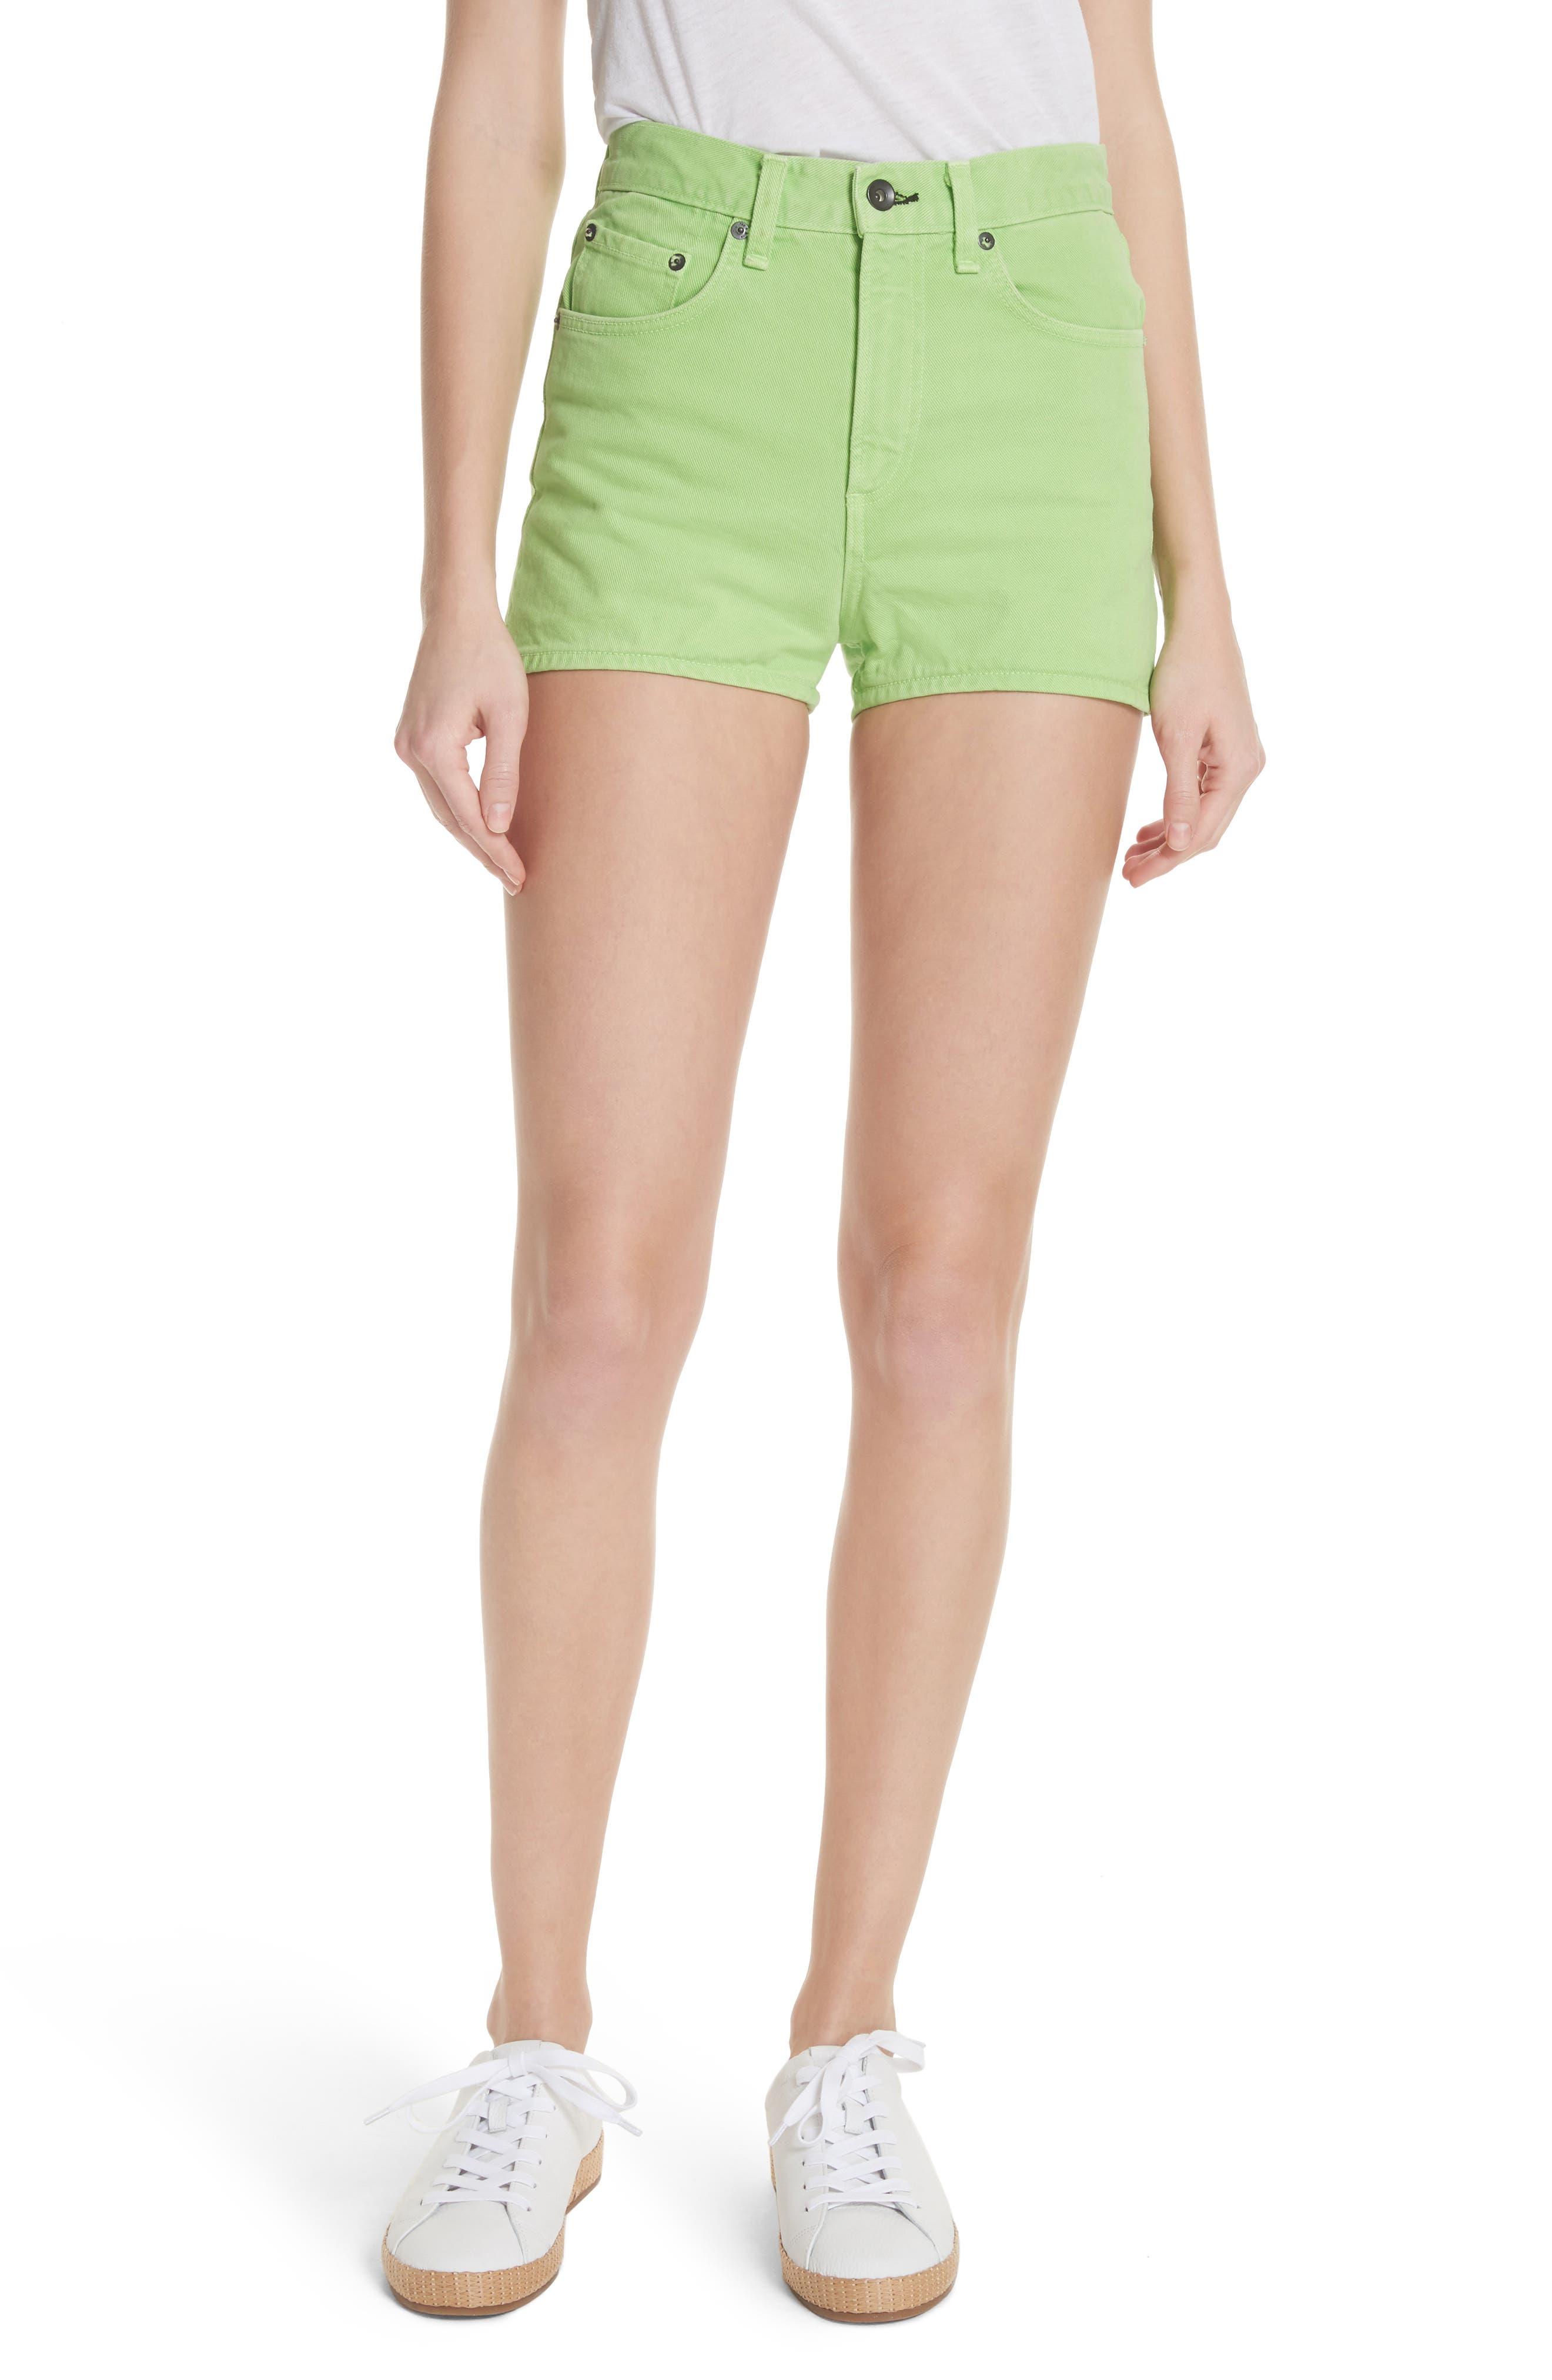 Justine High Waist Denim Shorts,                         Main,                         color, Lime